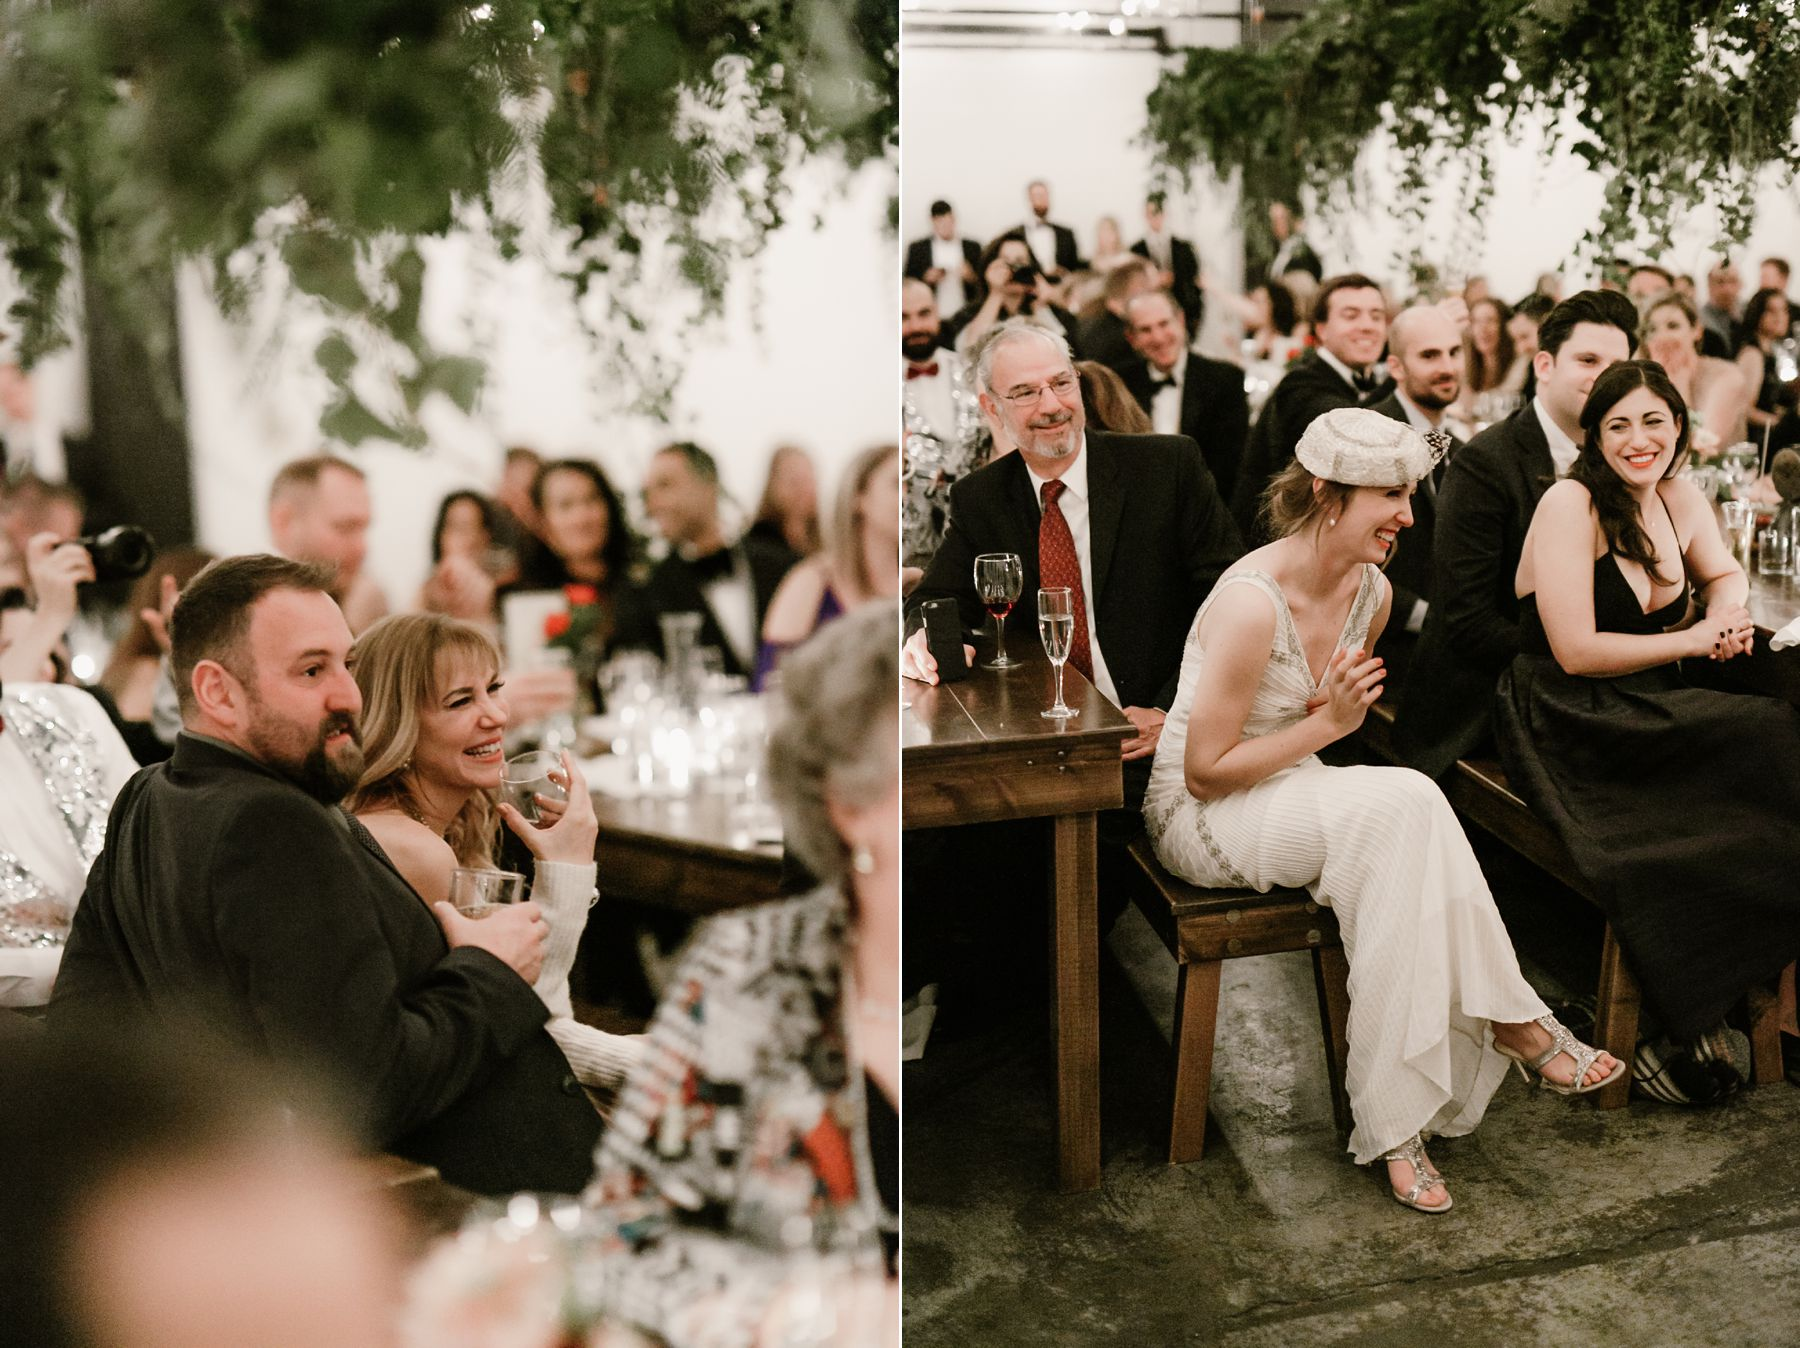 union-pine-wedding_0080.jpg